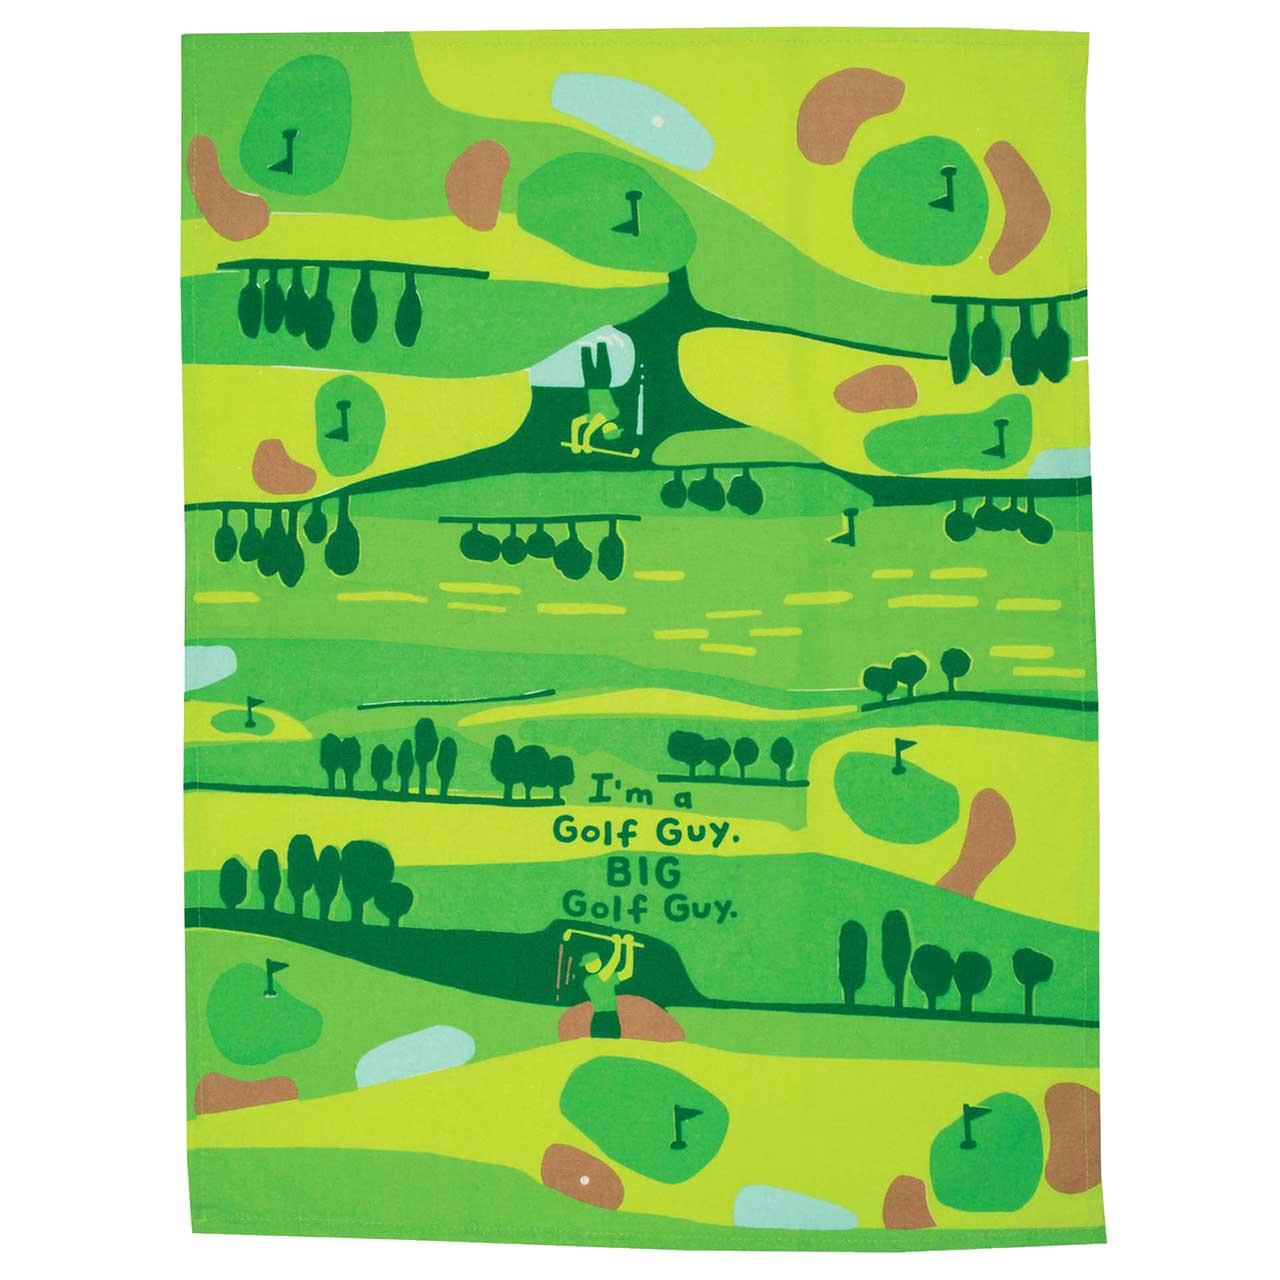 'I'm a Golf Guy, Big Golf Guy' Dish Towel by Blue Q  | The Design Gift Shop